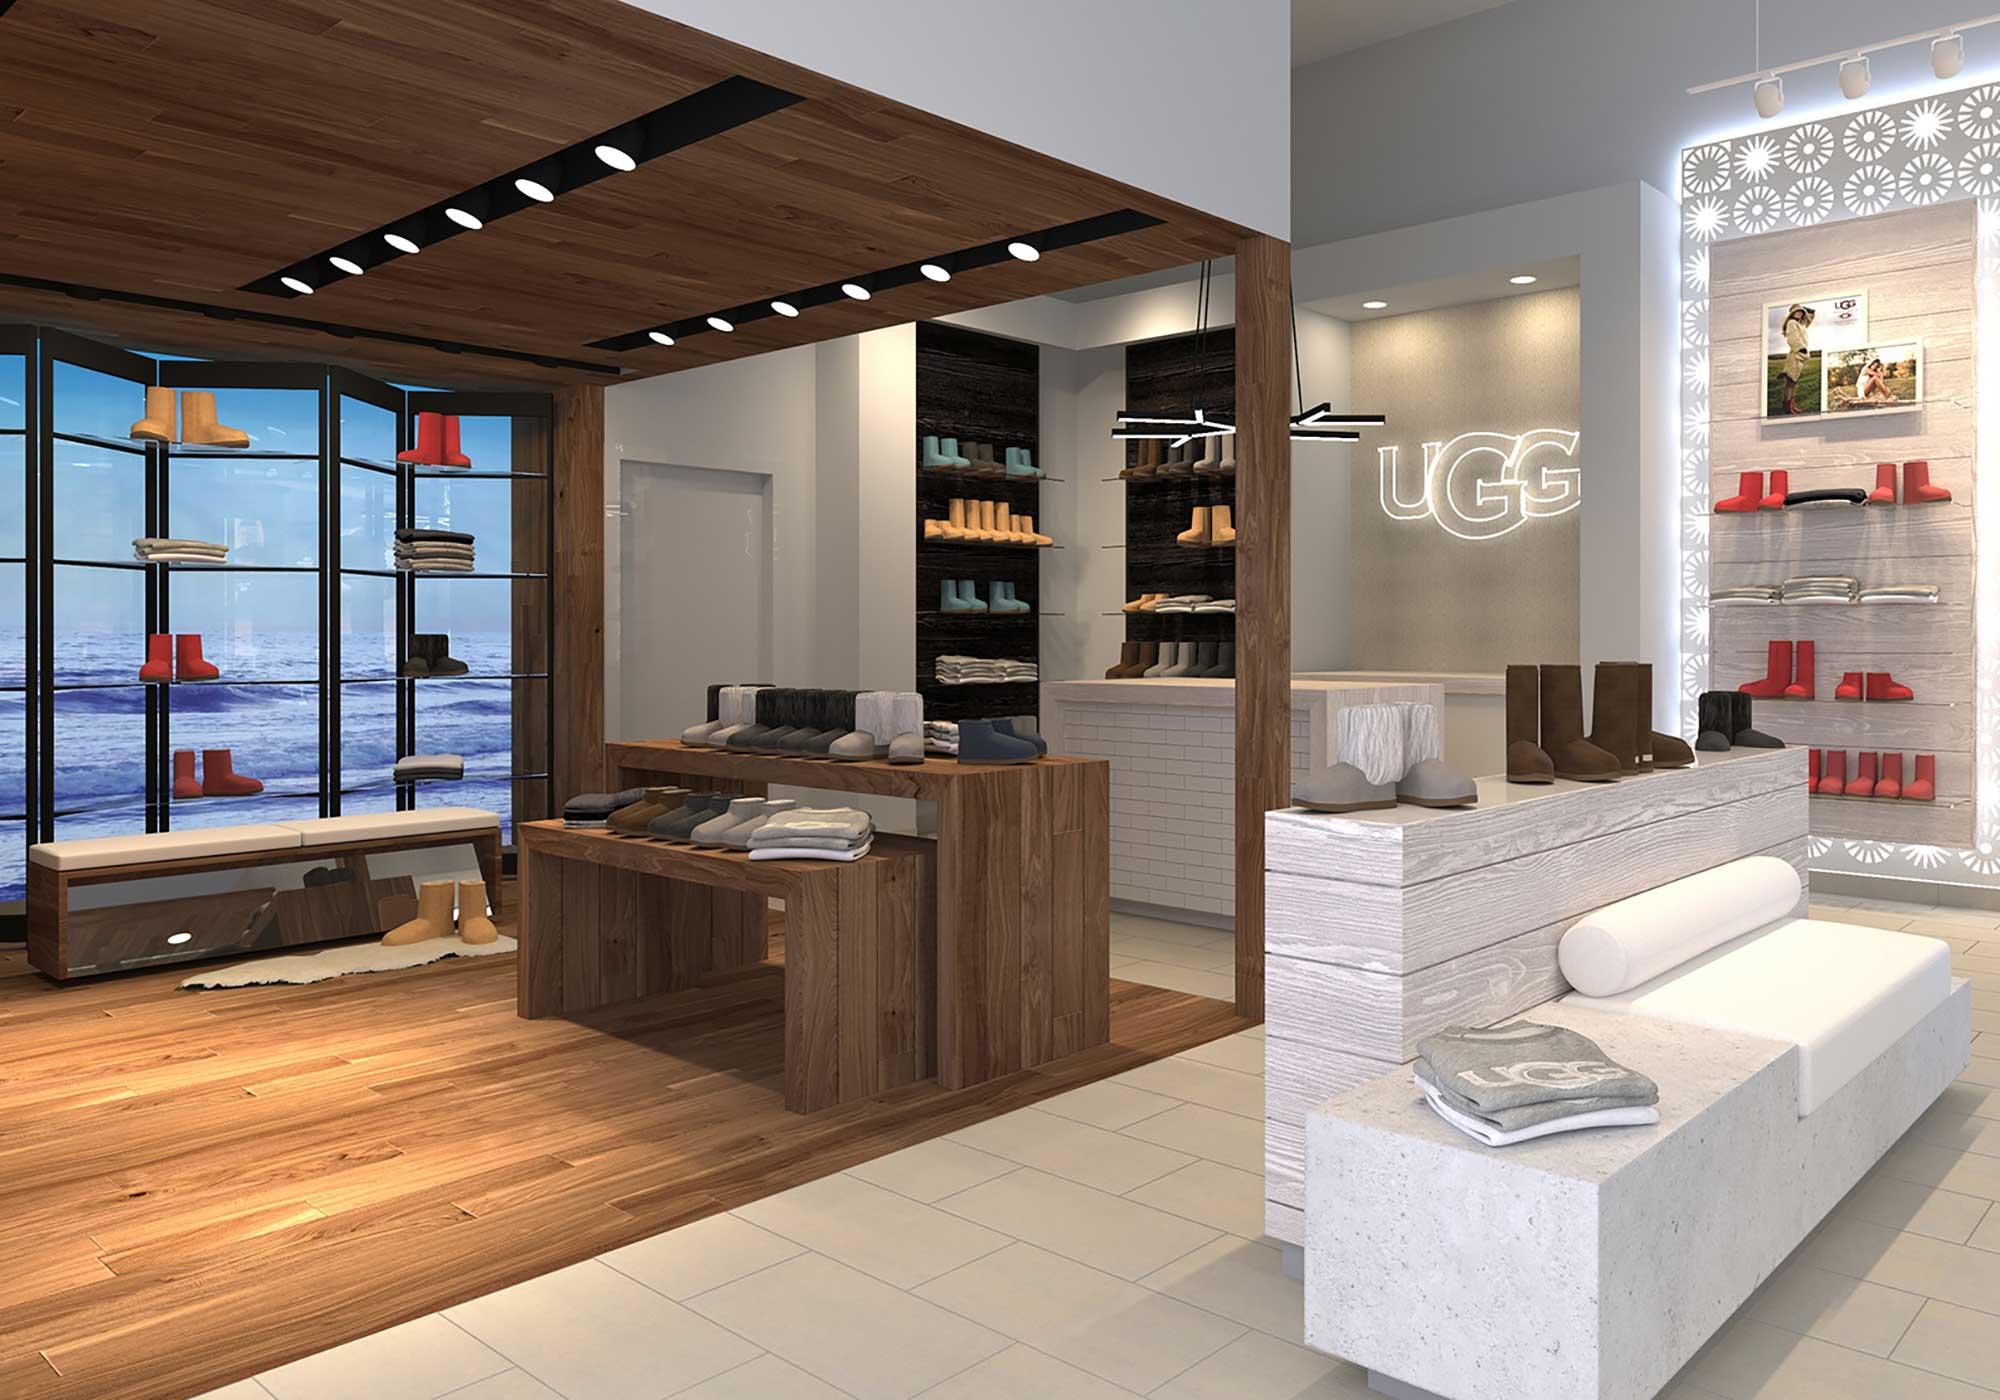 Rendering of store interior